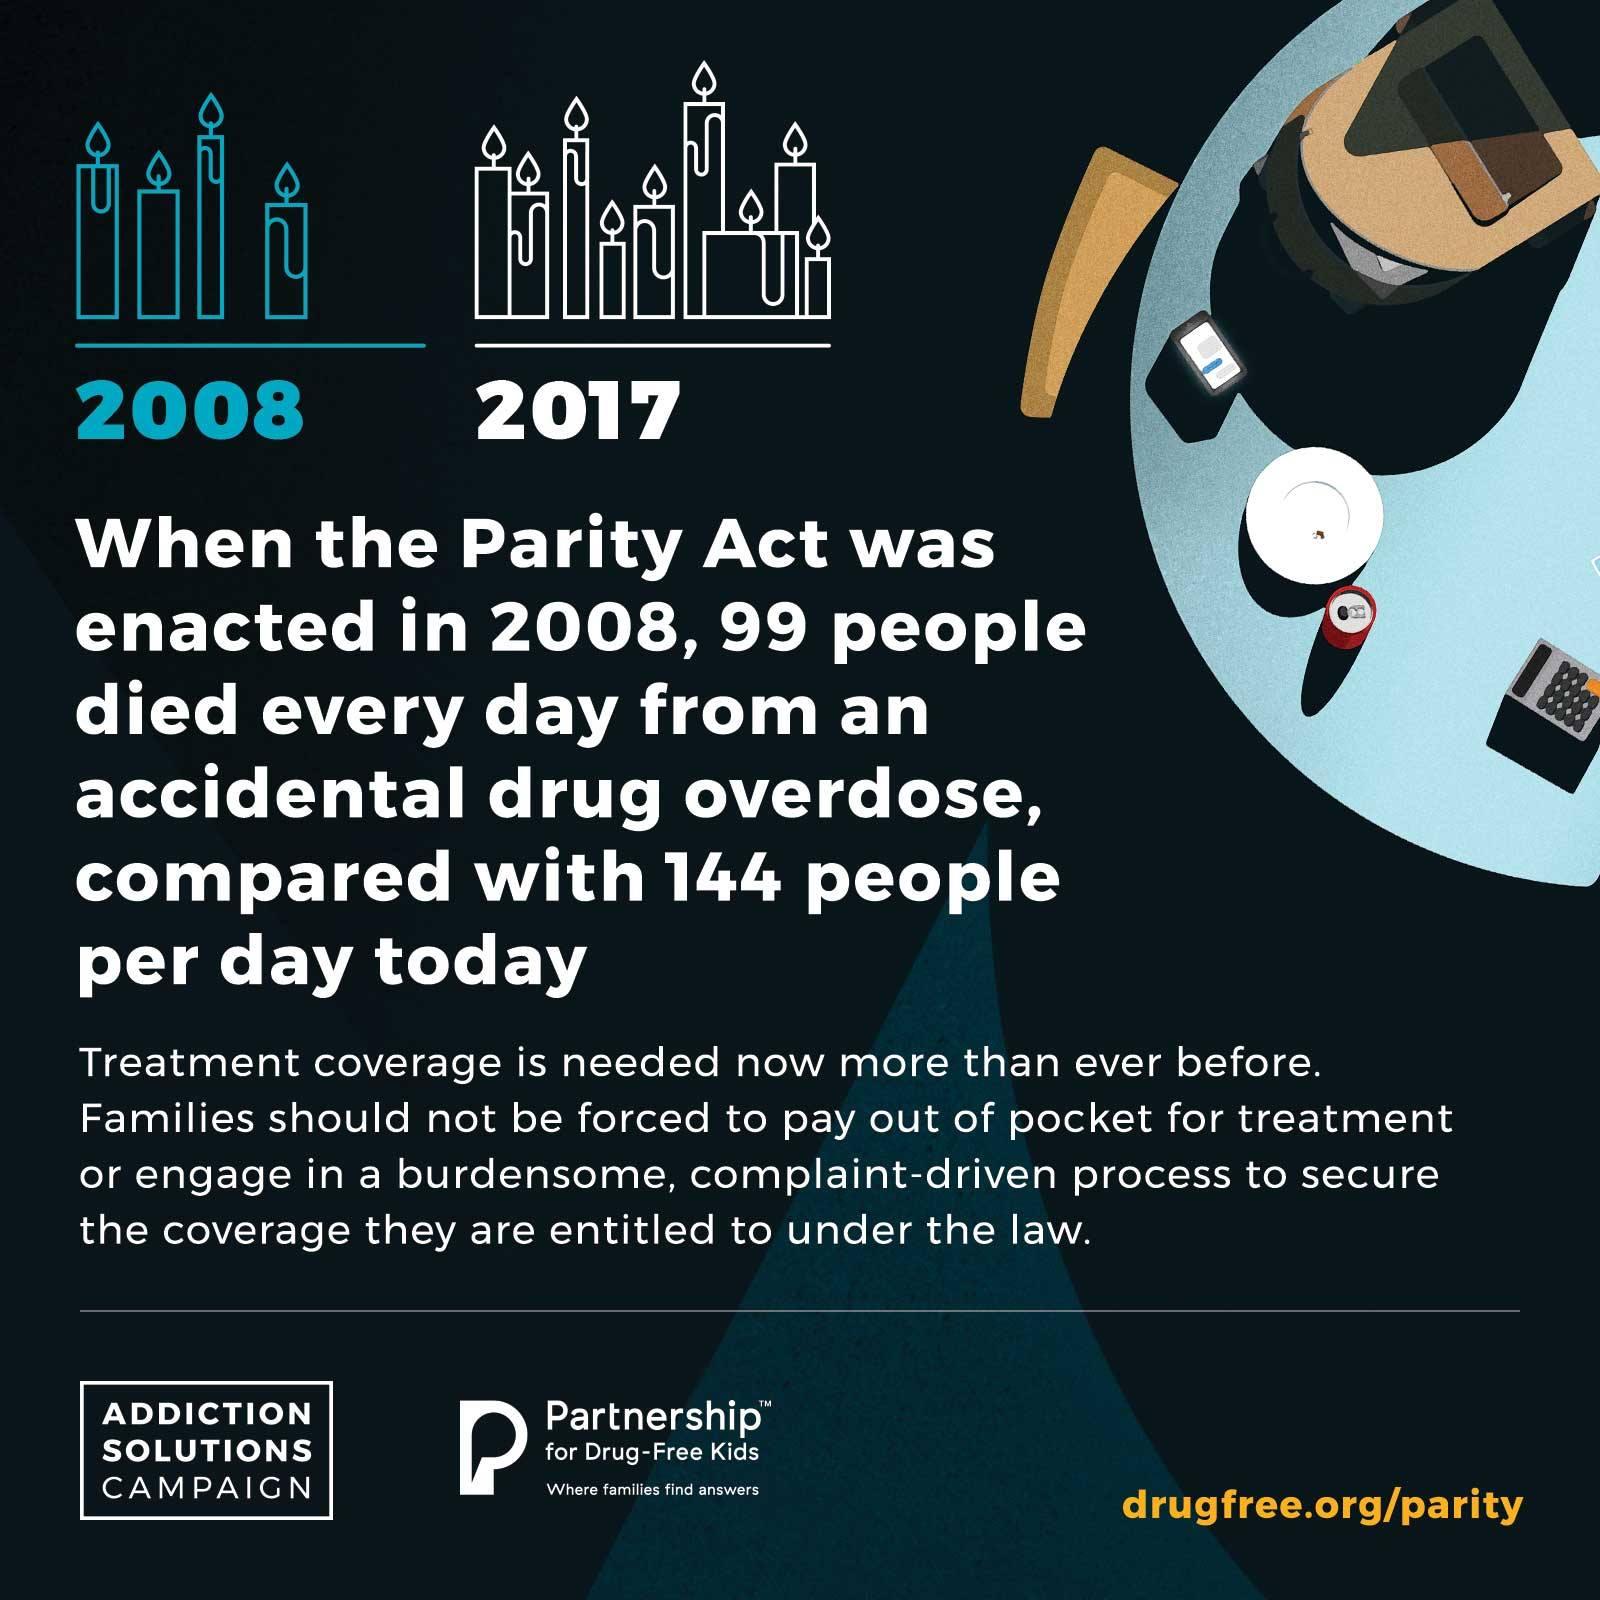 drug-addiction-solutions